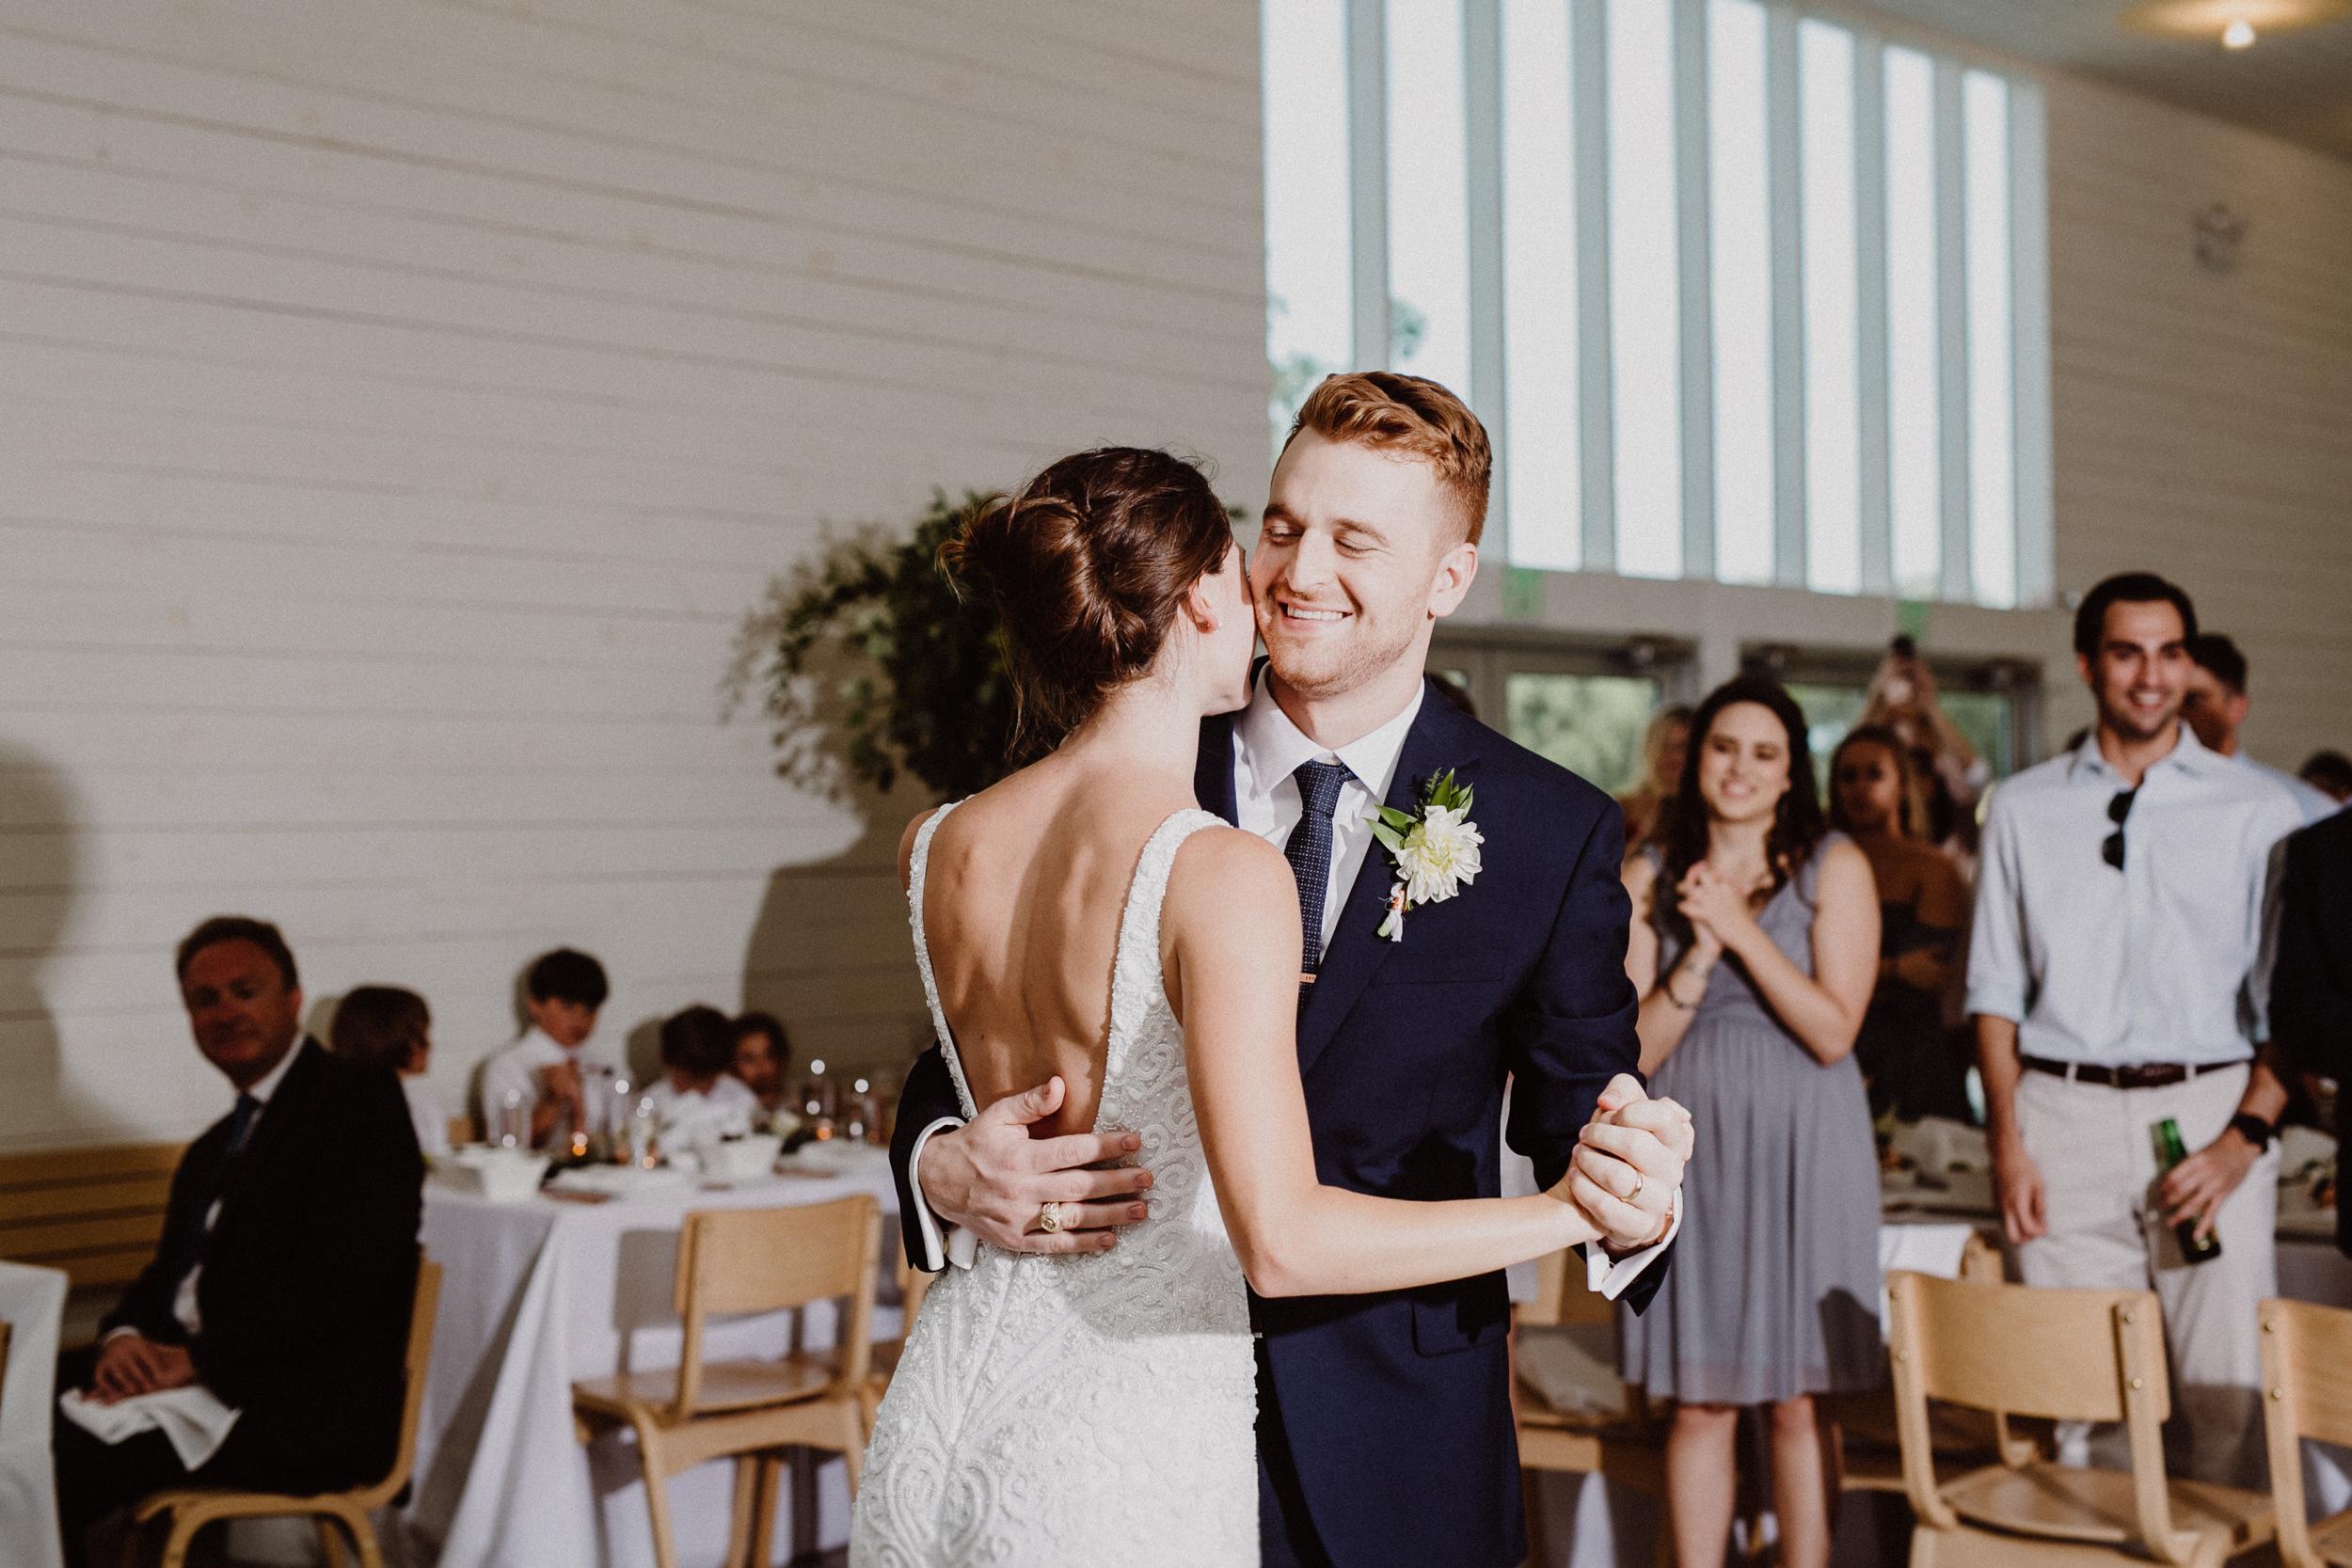 prospect-house-wedding-S&AC-808.jpg